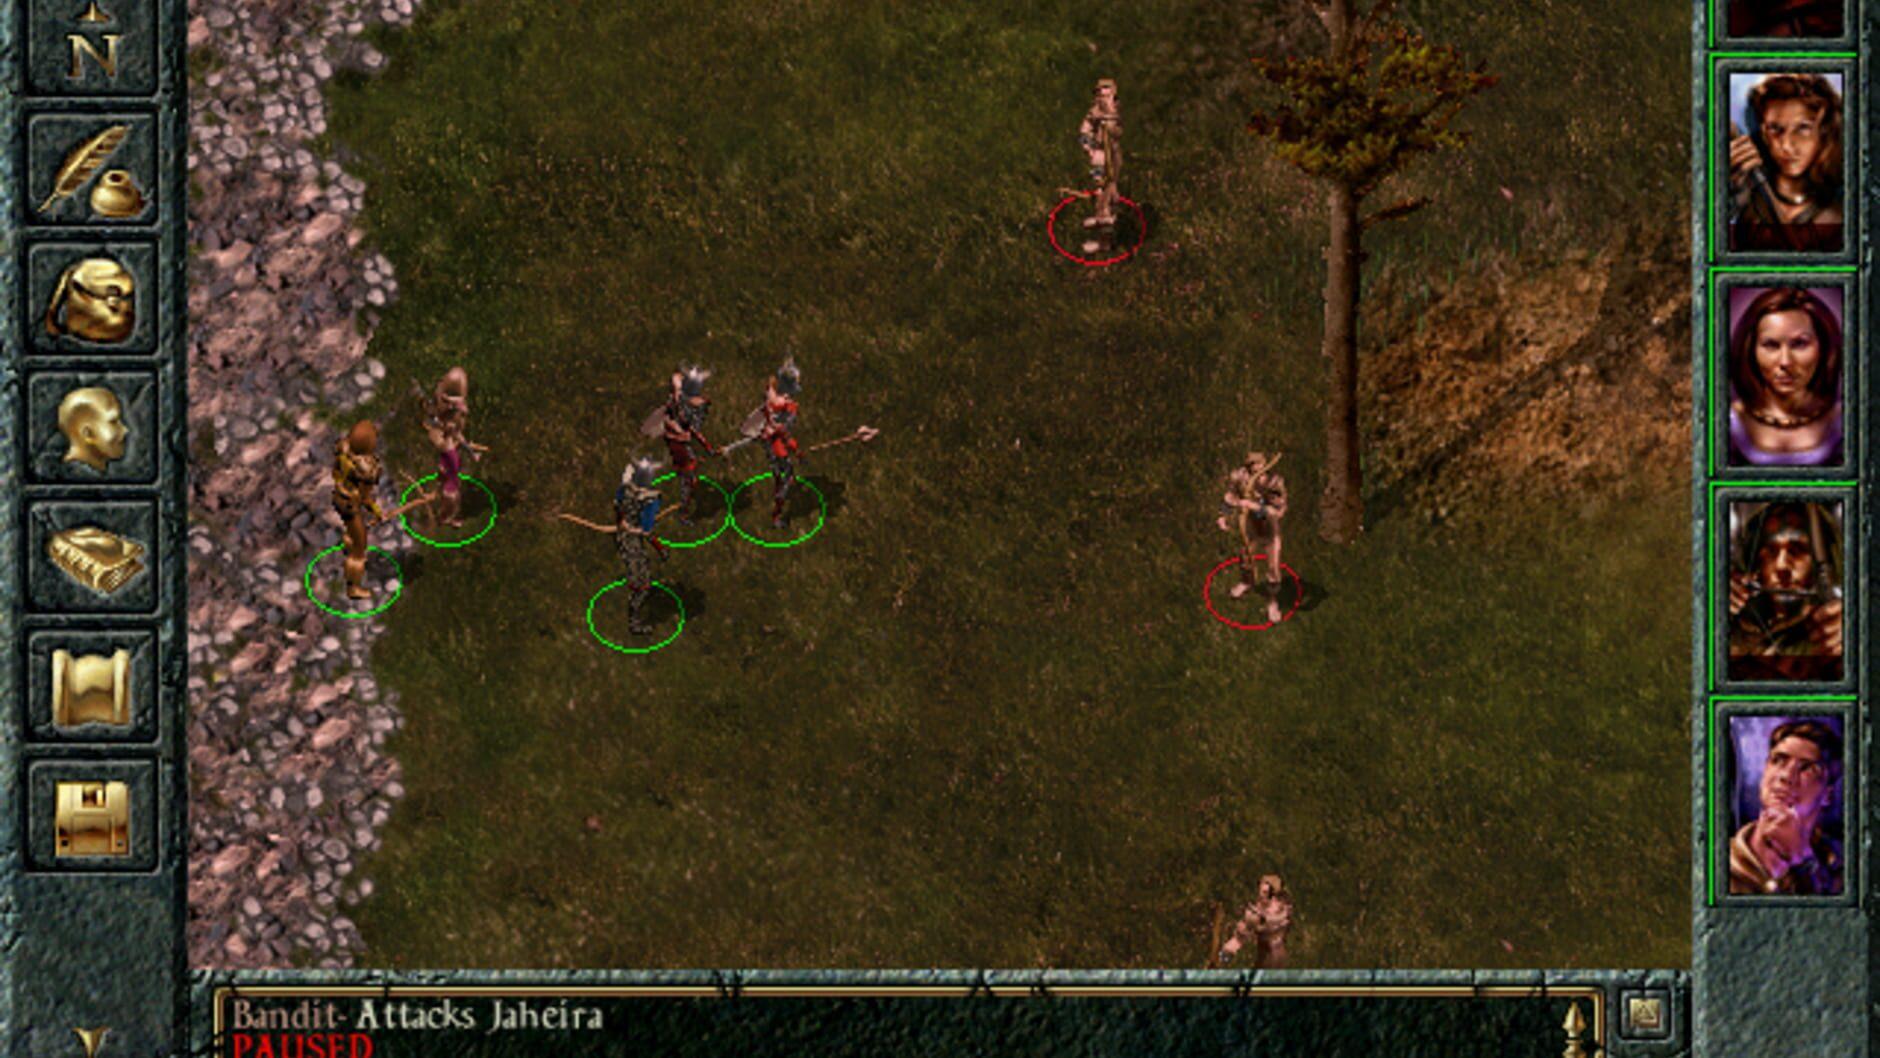 Baldur's Gate - 3